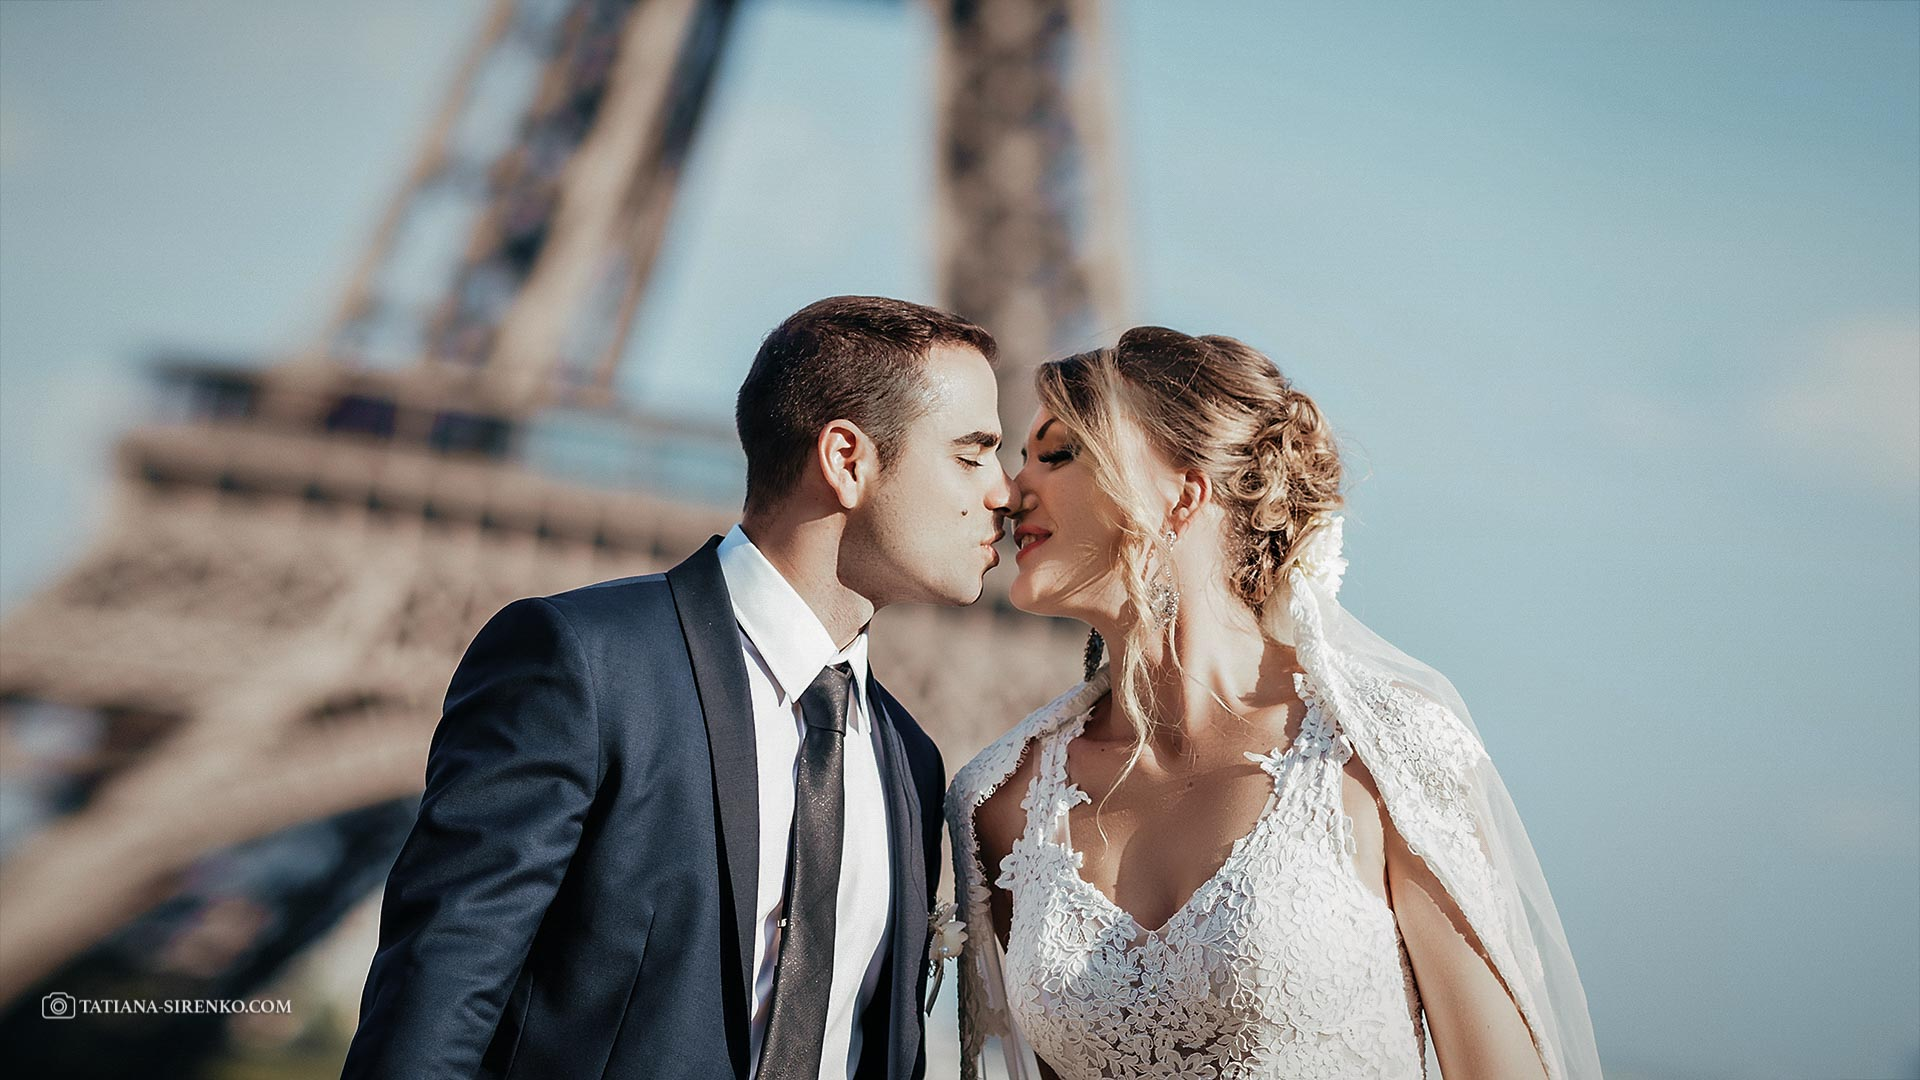 Свадебная фотосъемка во Франции